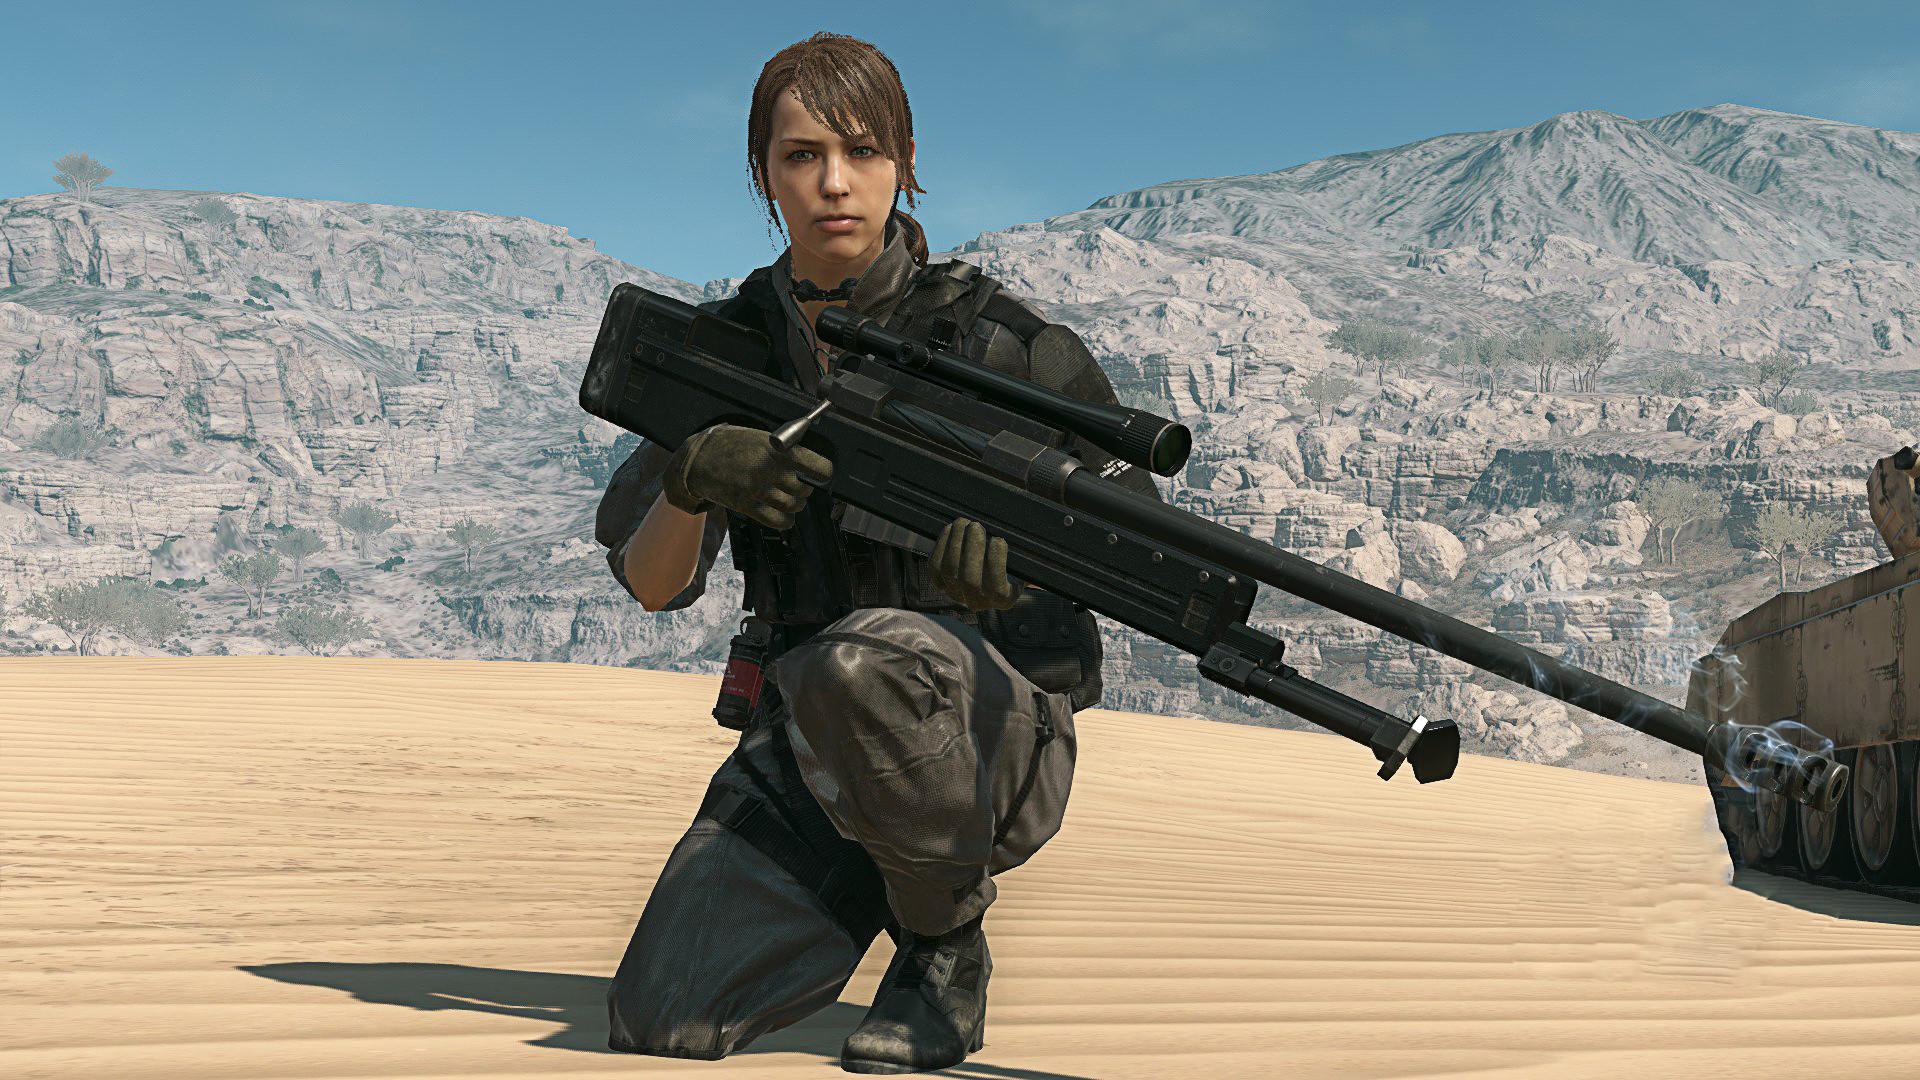 Quiet Metal Gear Solid V The Phantom Pain #ThePhantomPain #MetalGearSolidV  #DiamondDogs #MGSV